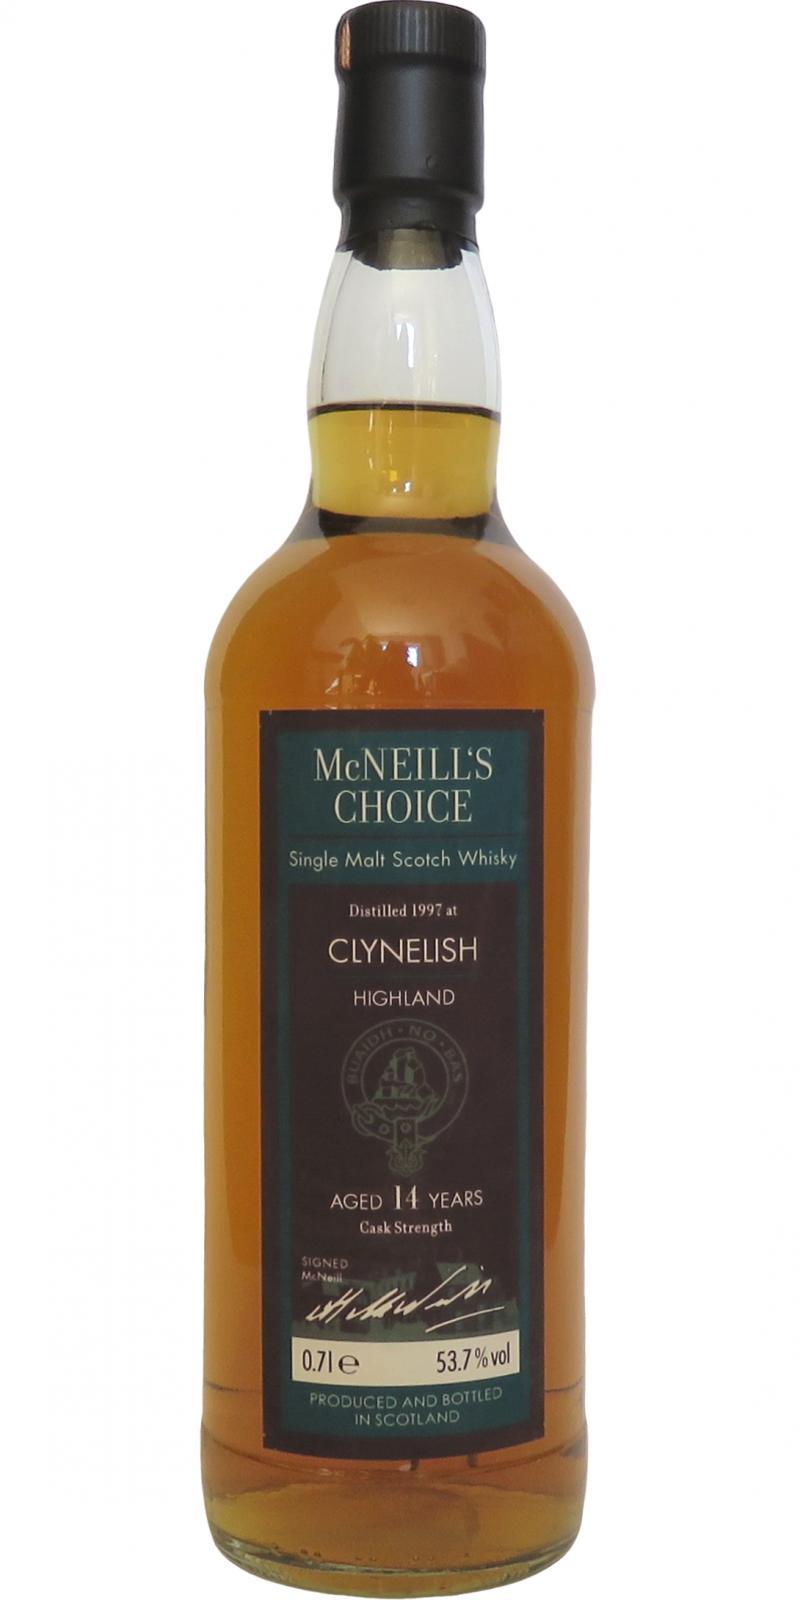 Clynelish 1997 MNC